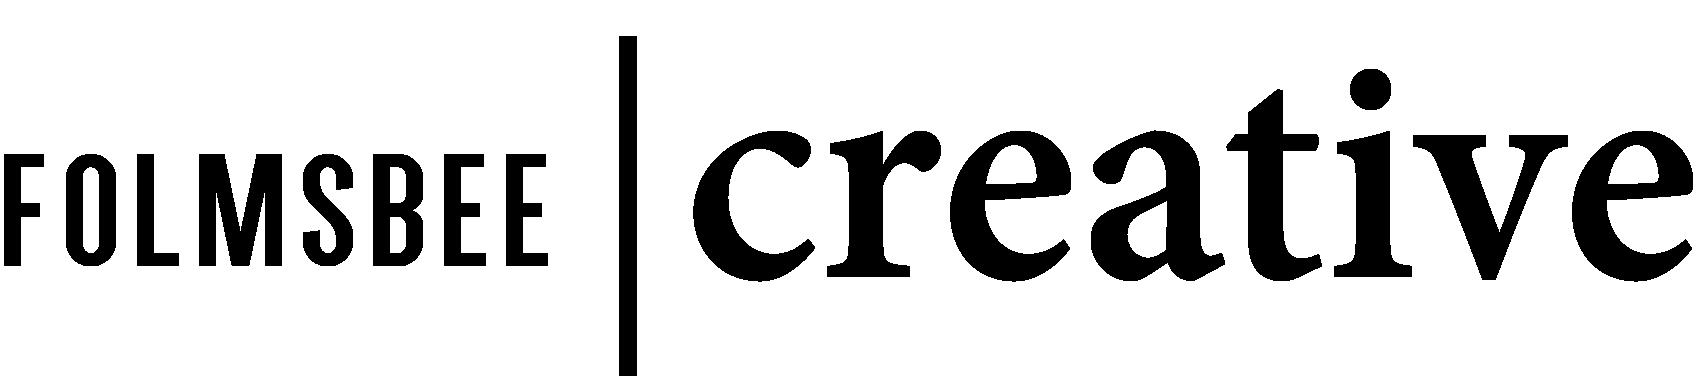 Folmsbee | creative